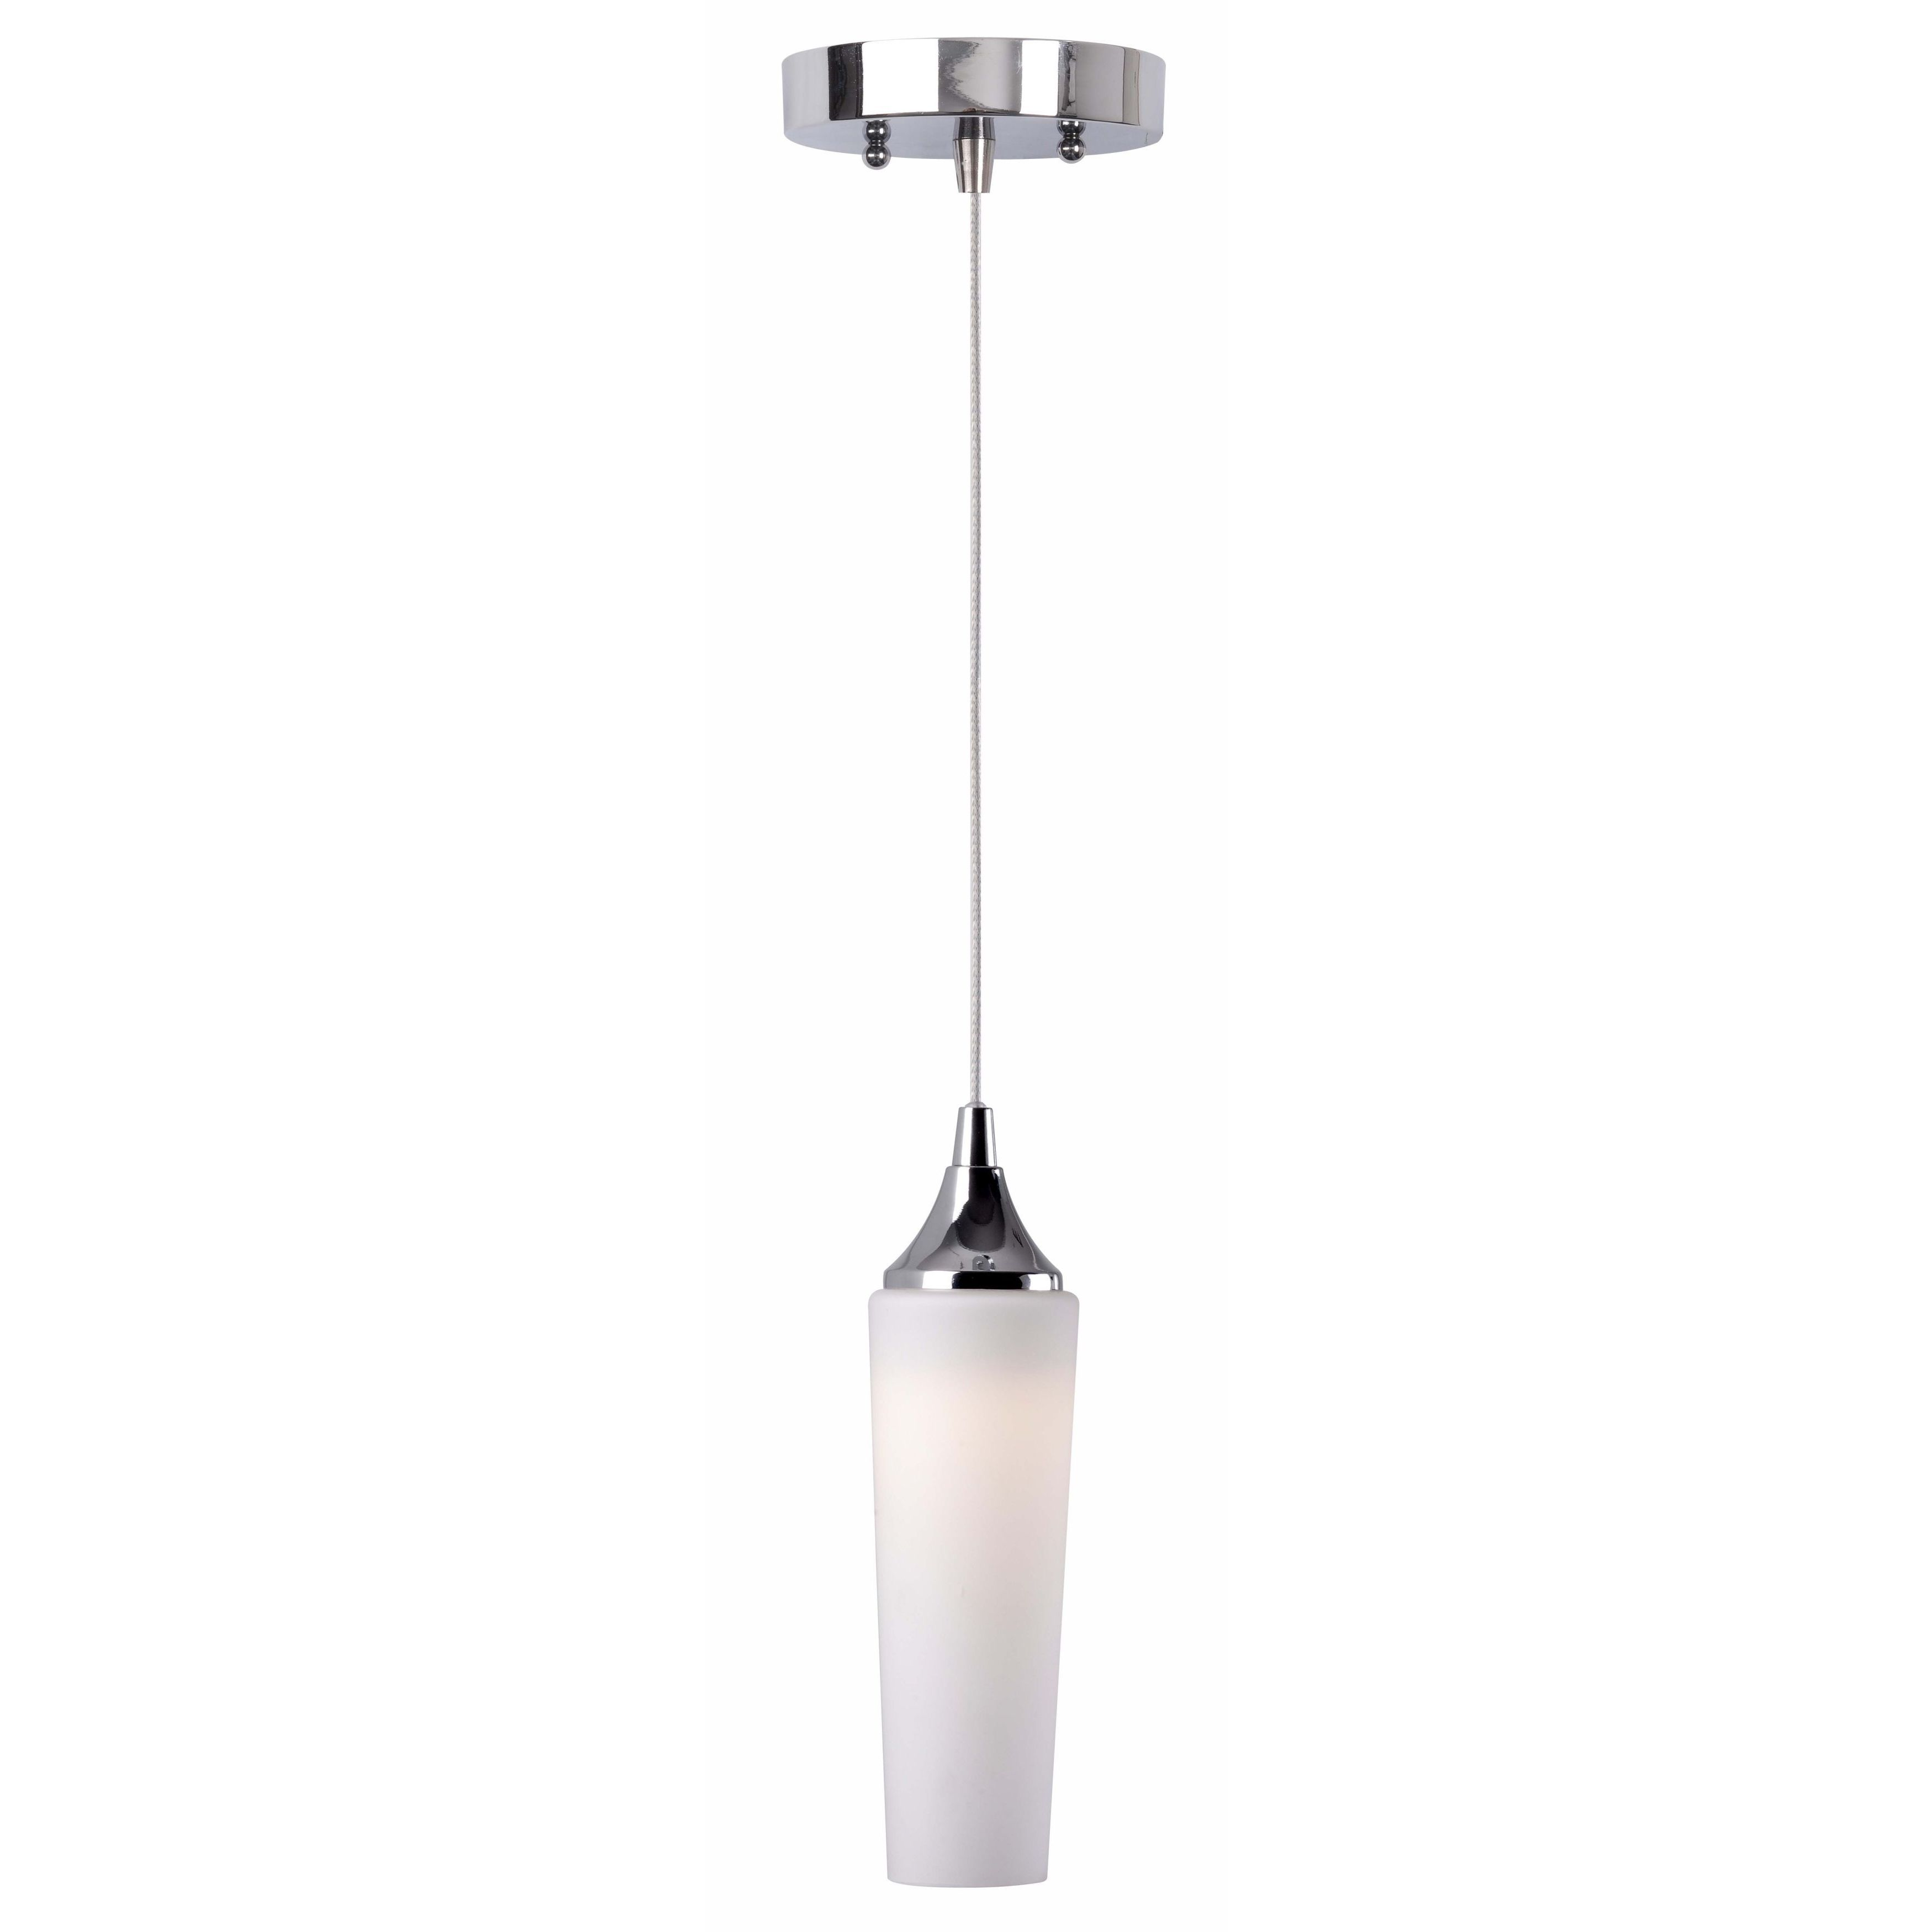 Design Craft Igloo LED Mini Pendant, Grey chrome (Metal)